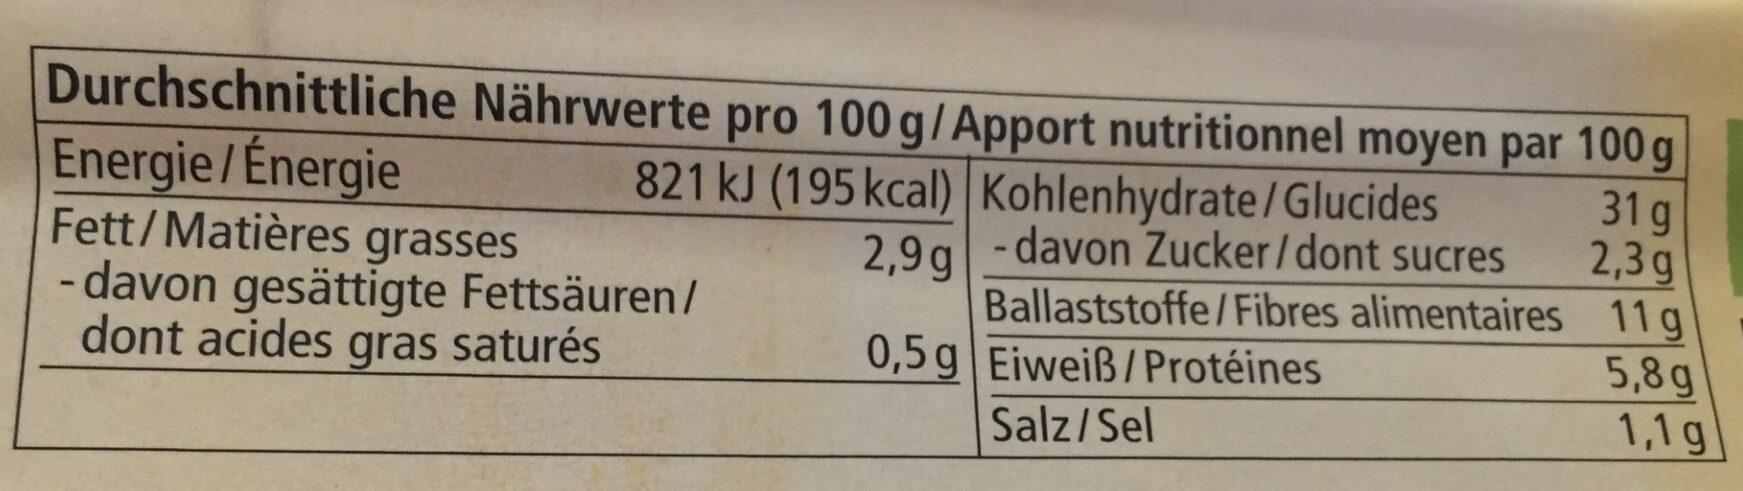 Roggenvollkornbrot - Kürbiskern - Nährwertangaben - de